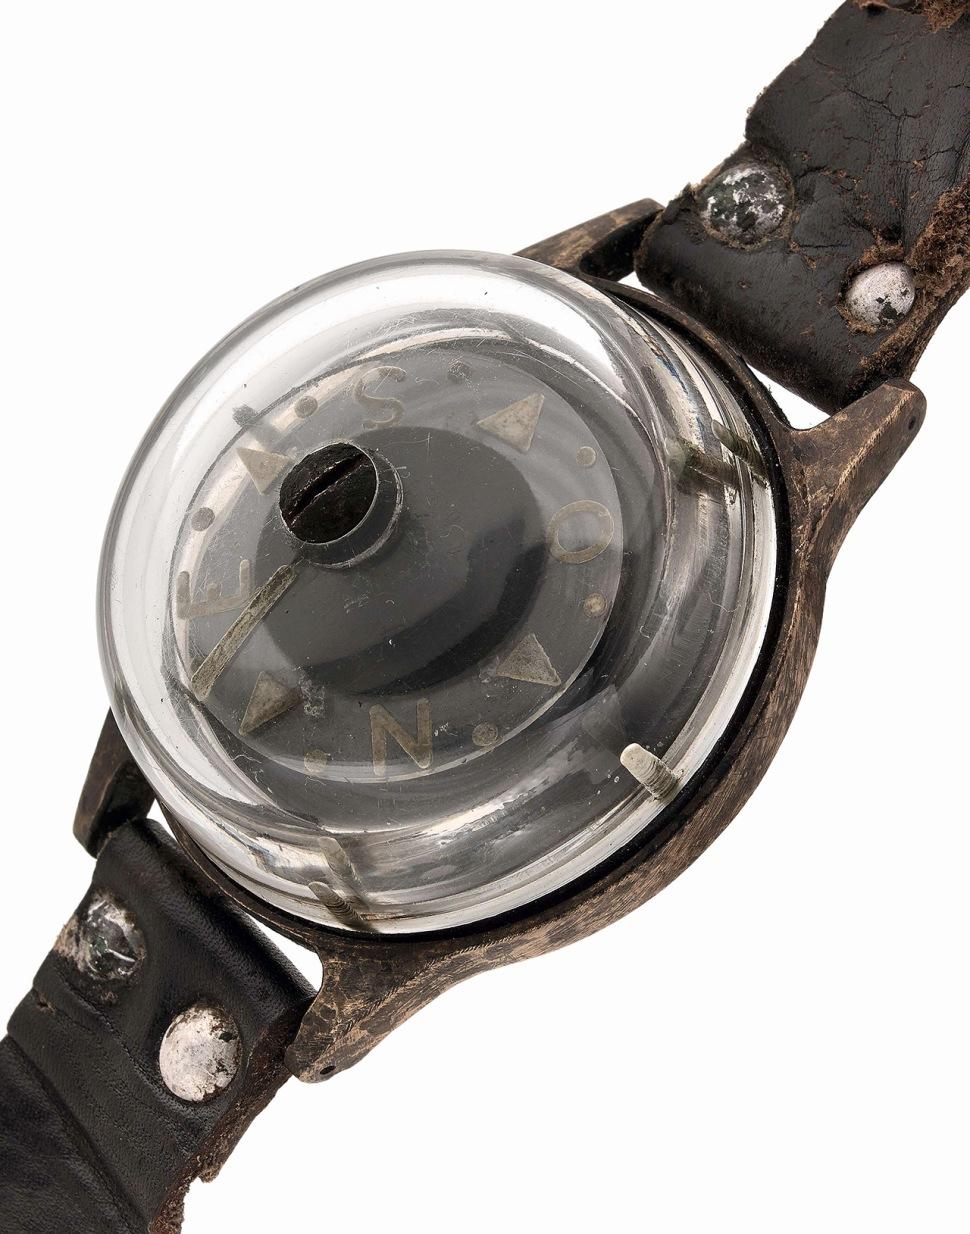 190703-panerai-compass-1944